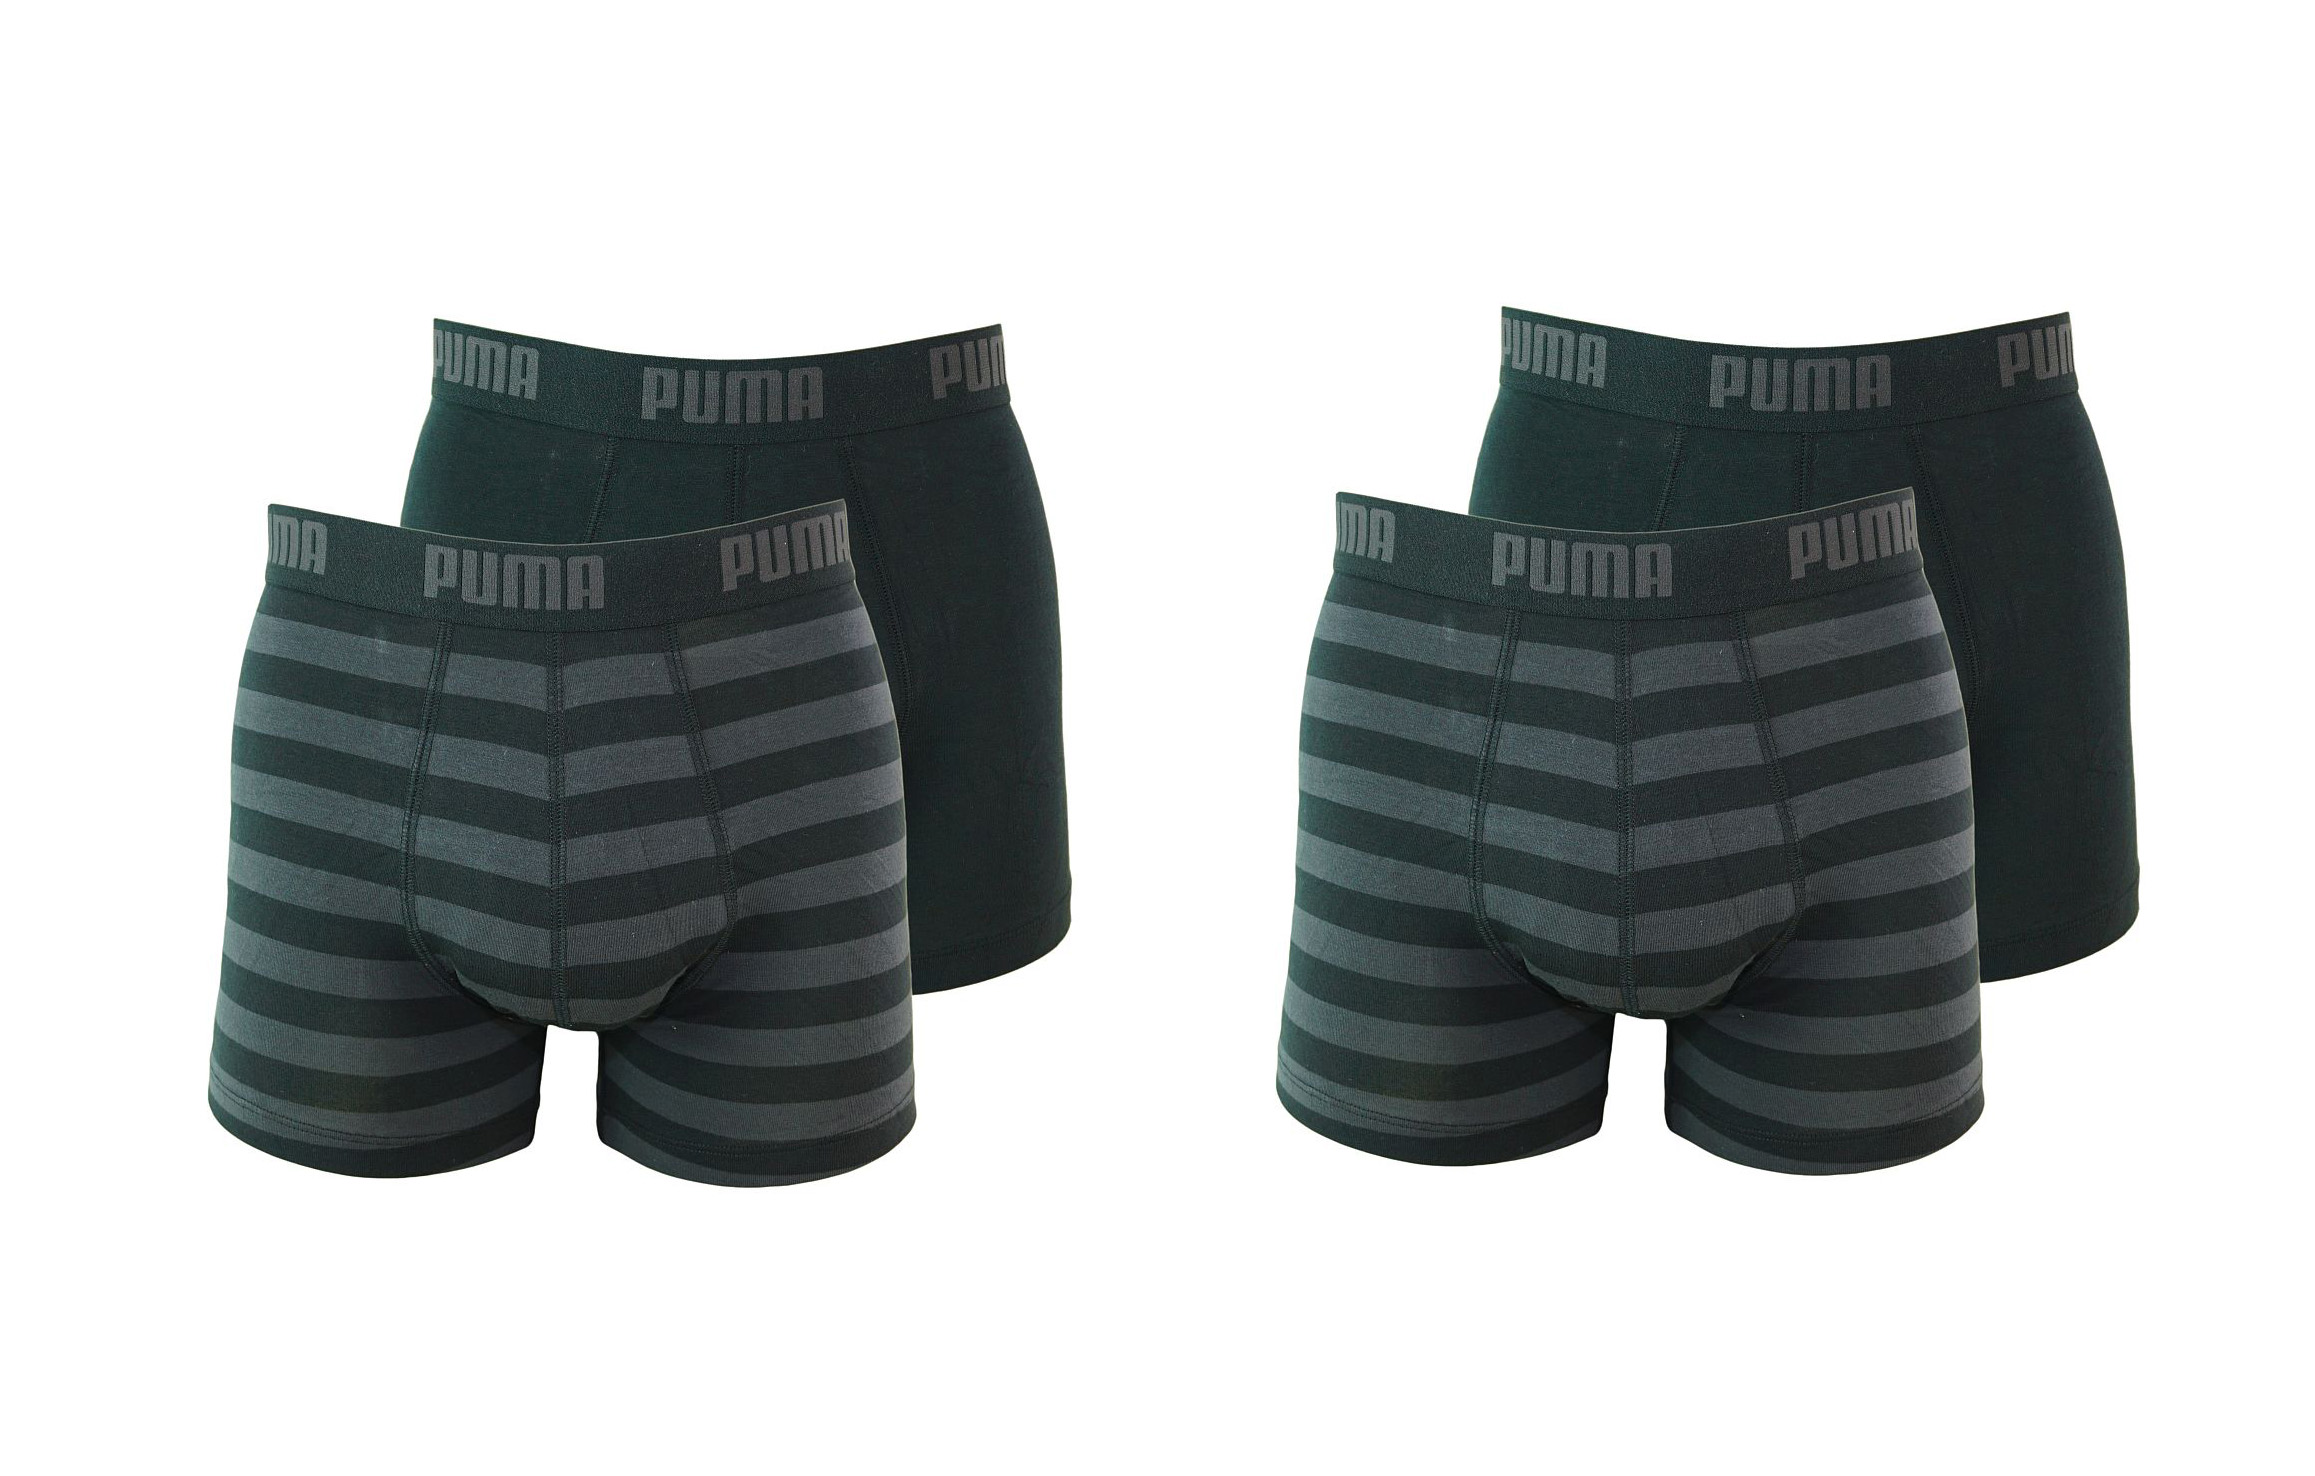 PUMA Shorts Unterhosen 2 x 2er Pack Boxer 651001001 200 020 black SF17-PMS2